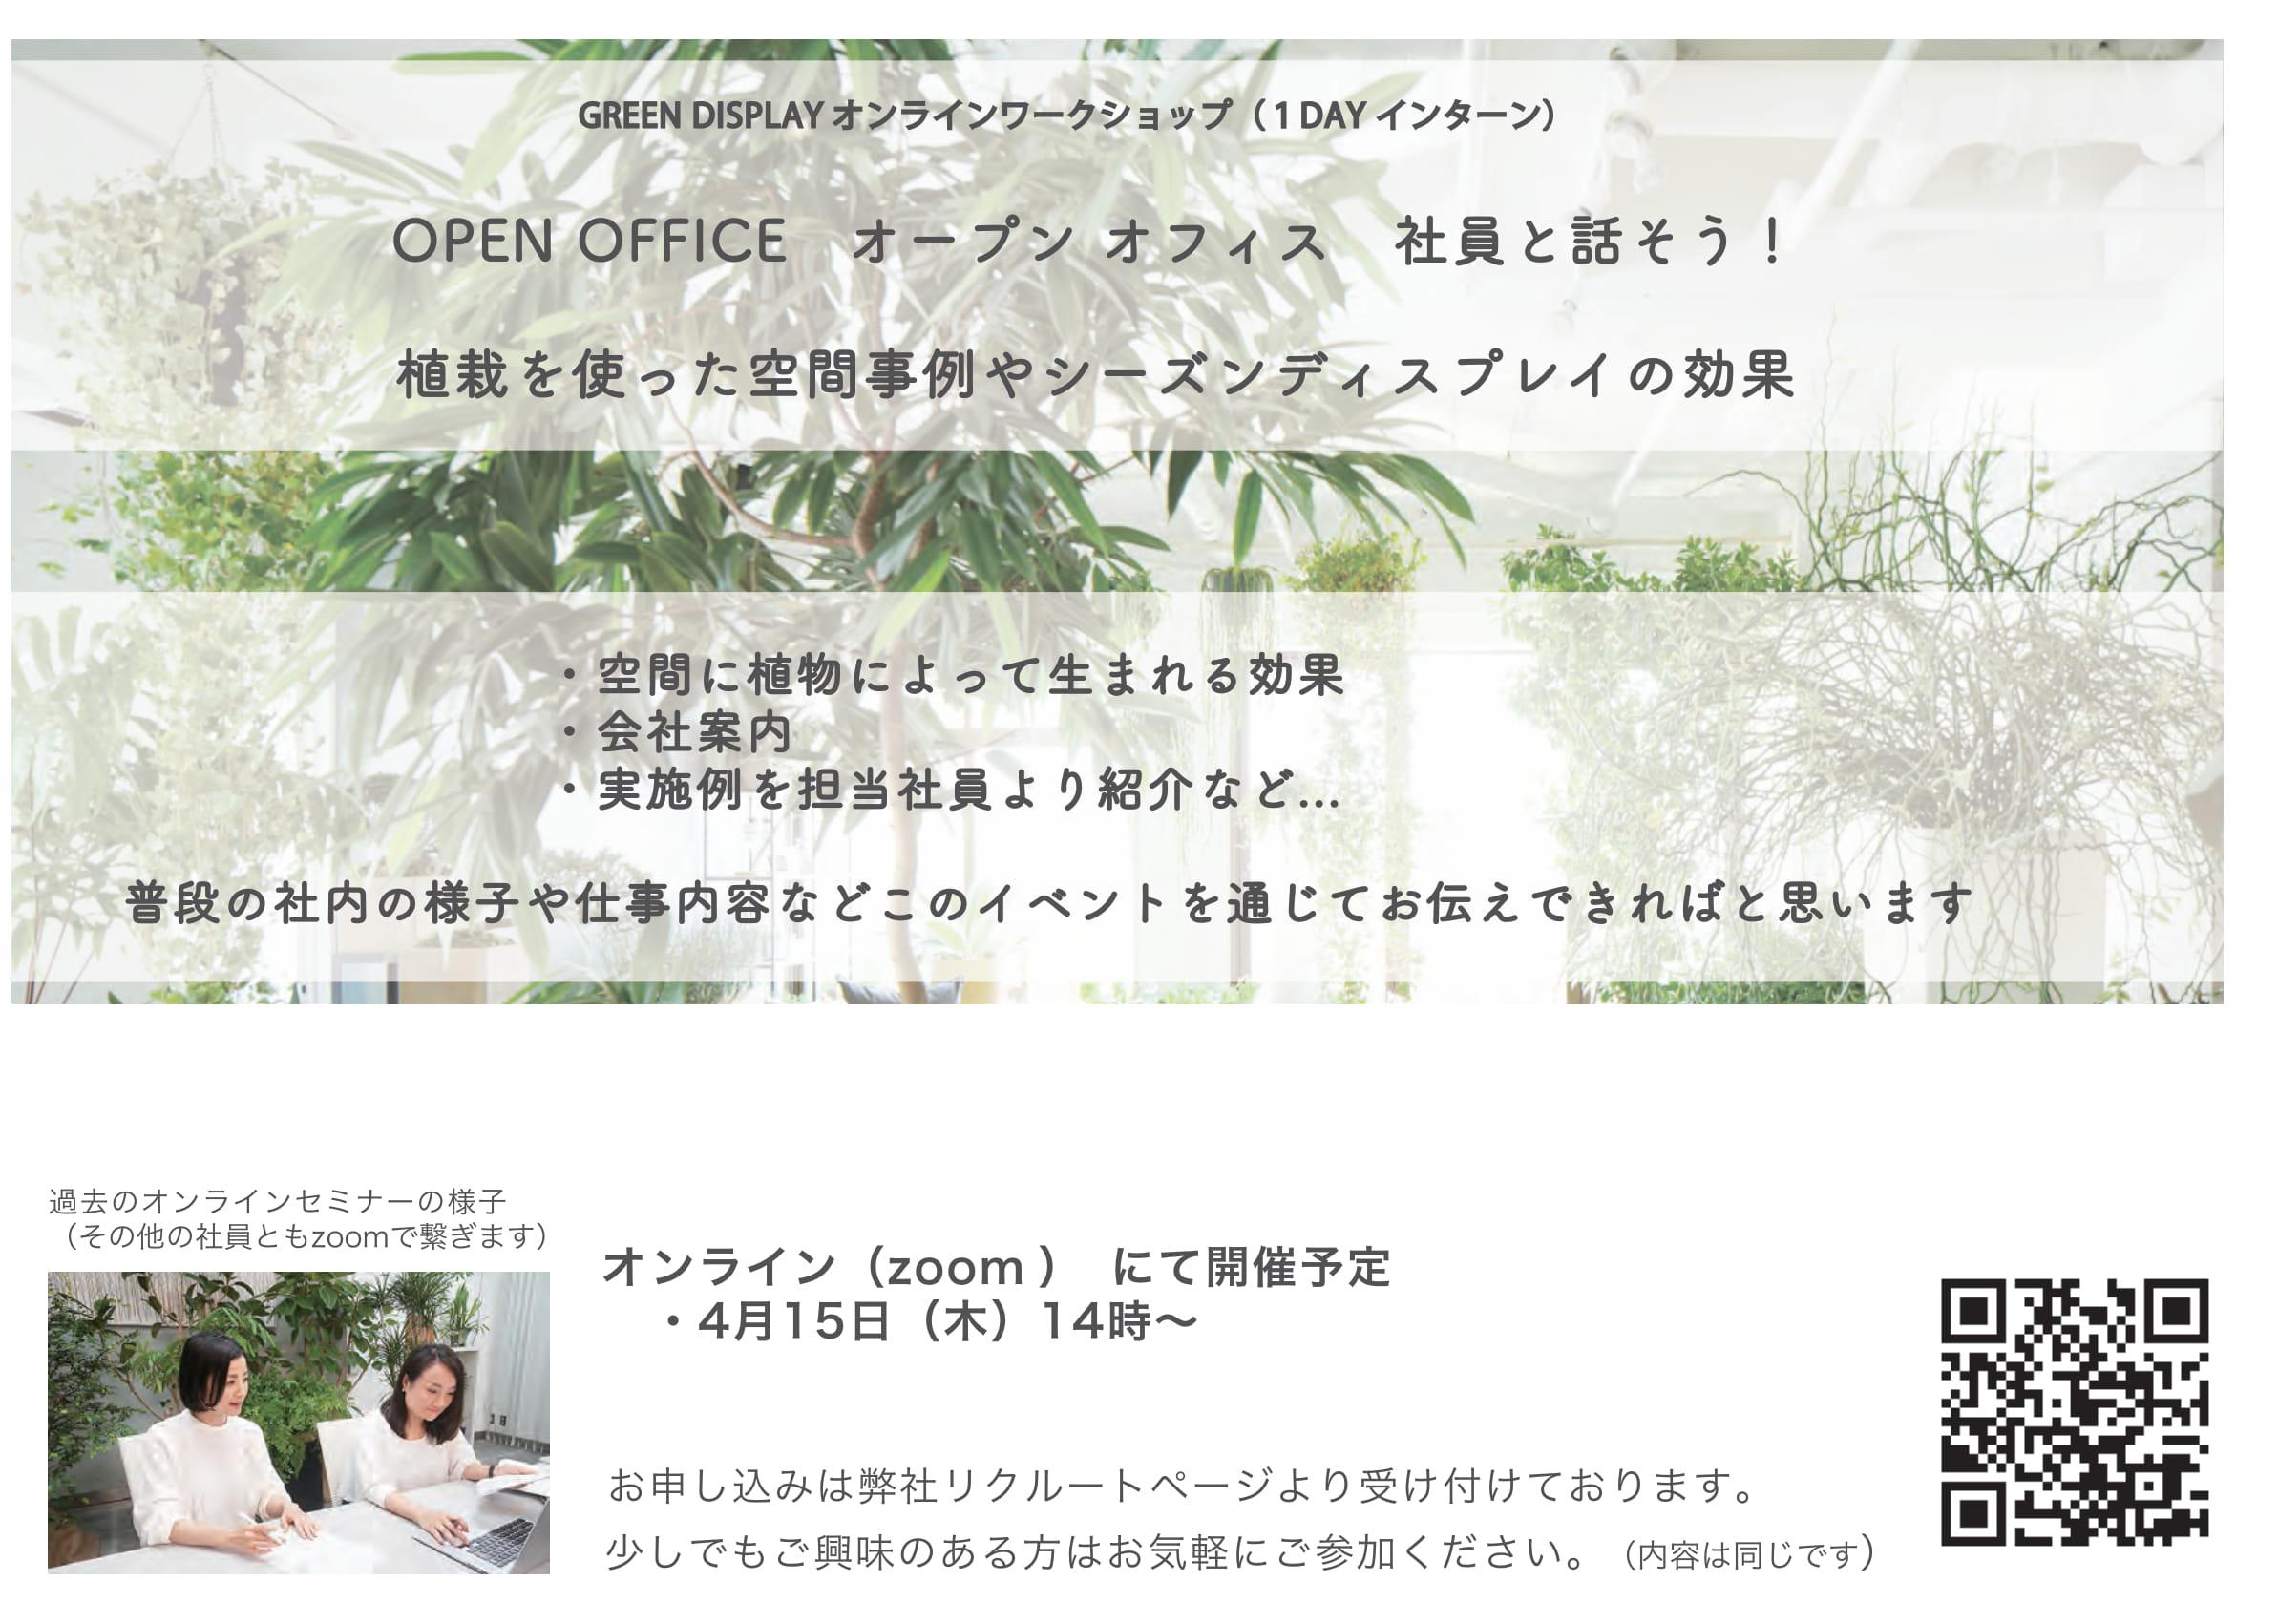 4-15GREEN DISPLAYセミナー案内-1.jpg